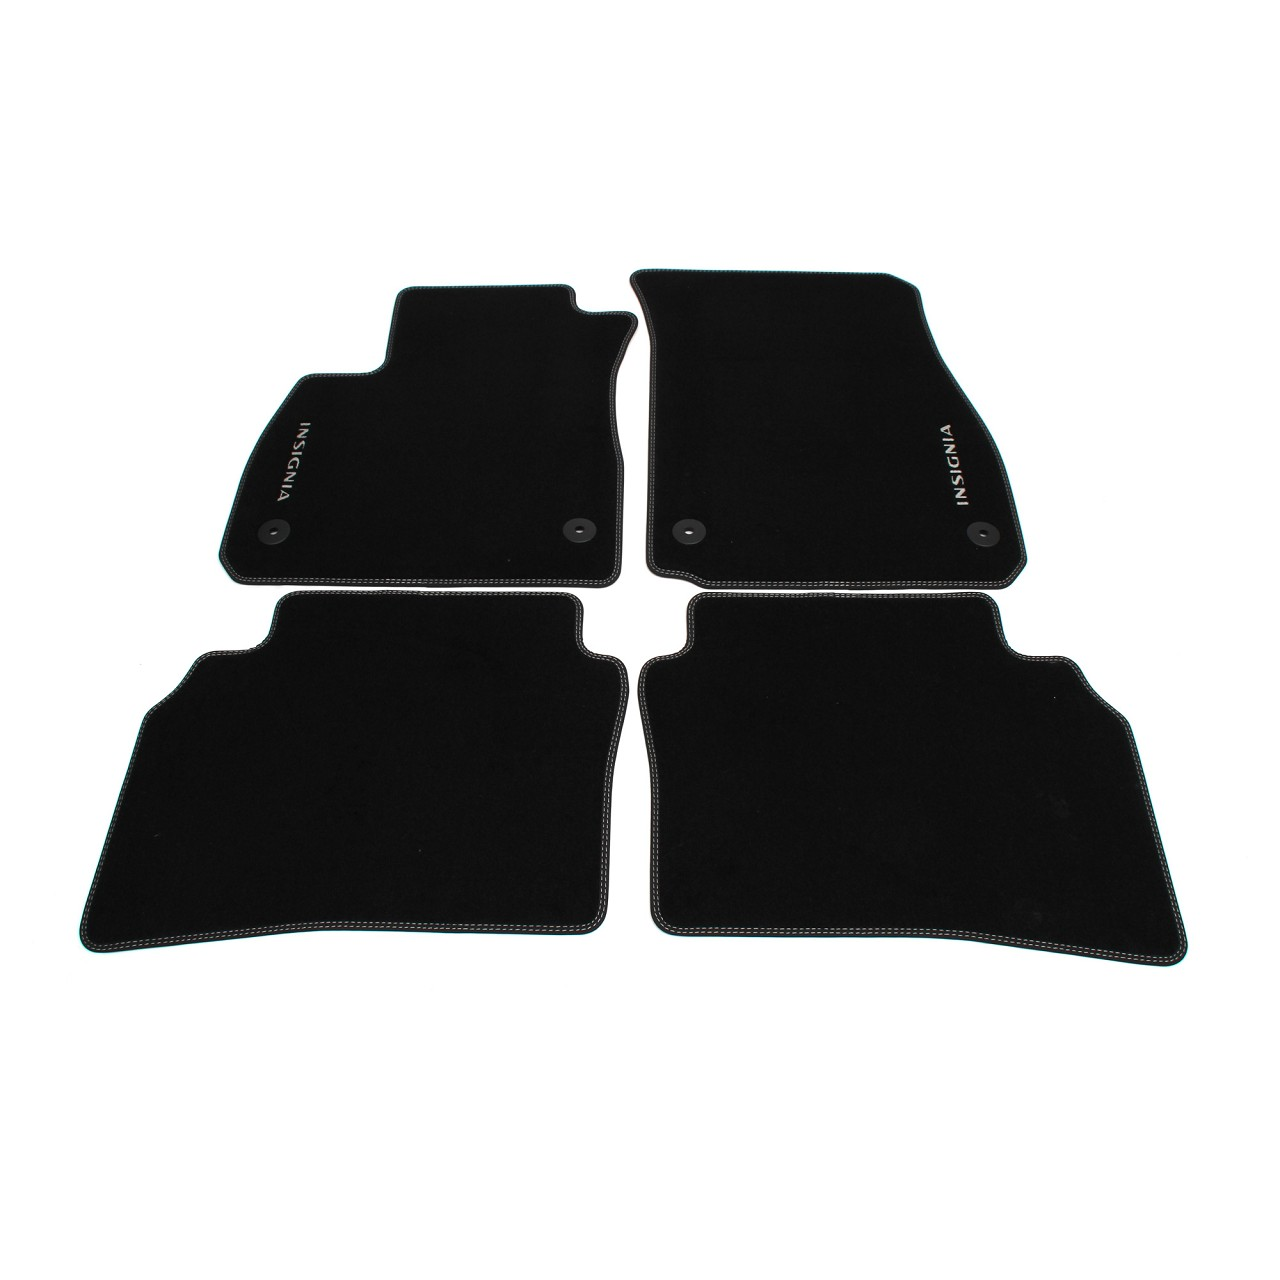 ORIGINAL Opel Textilmatten Fußmatten Automatten Satz INSIGNIA B 4-TLG 39200601